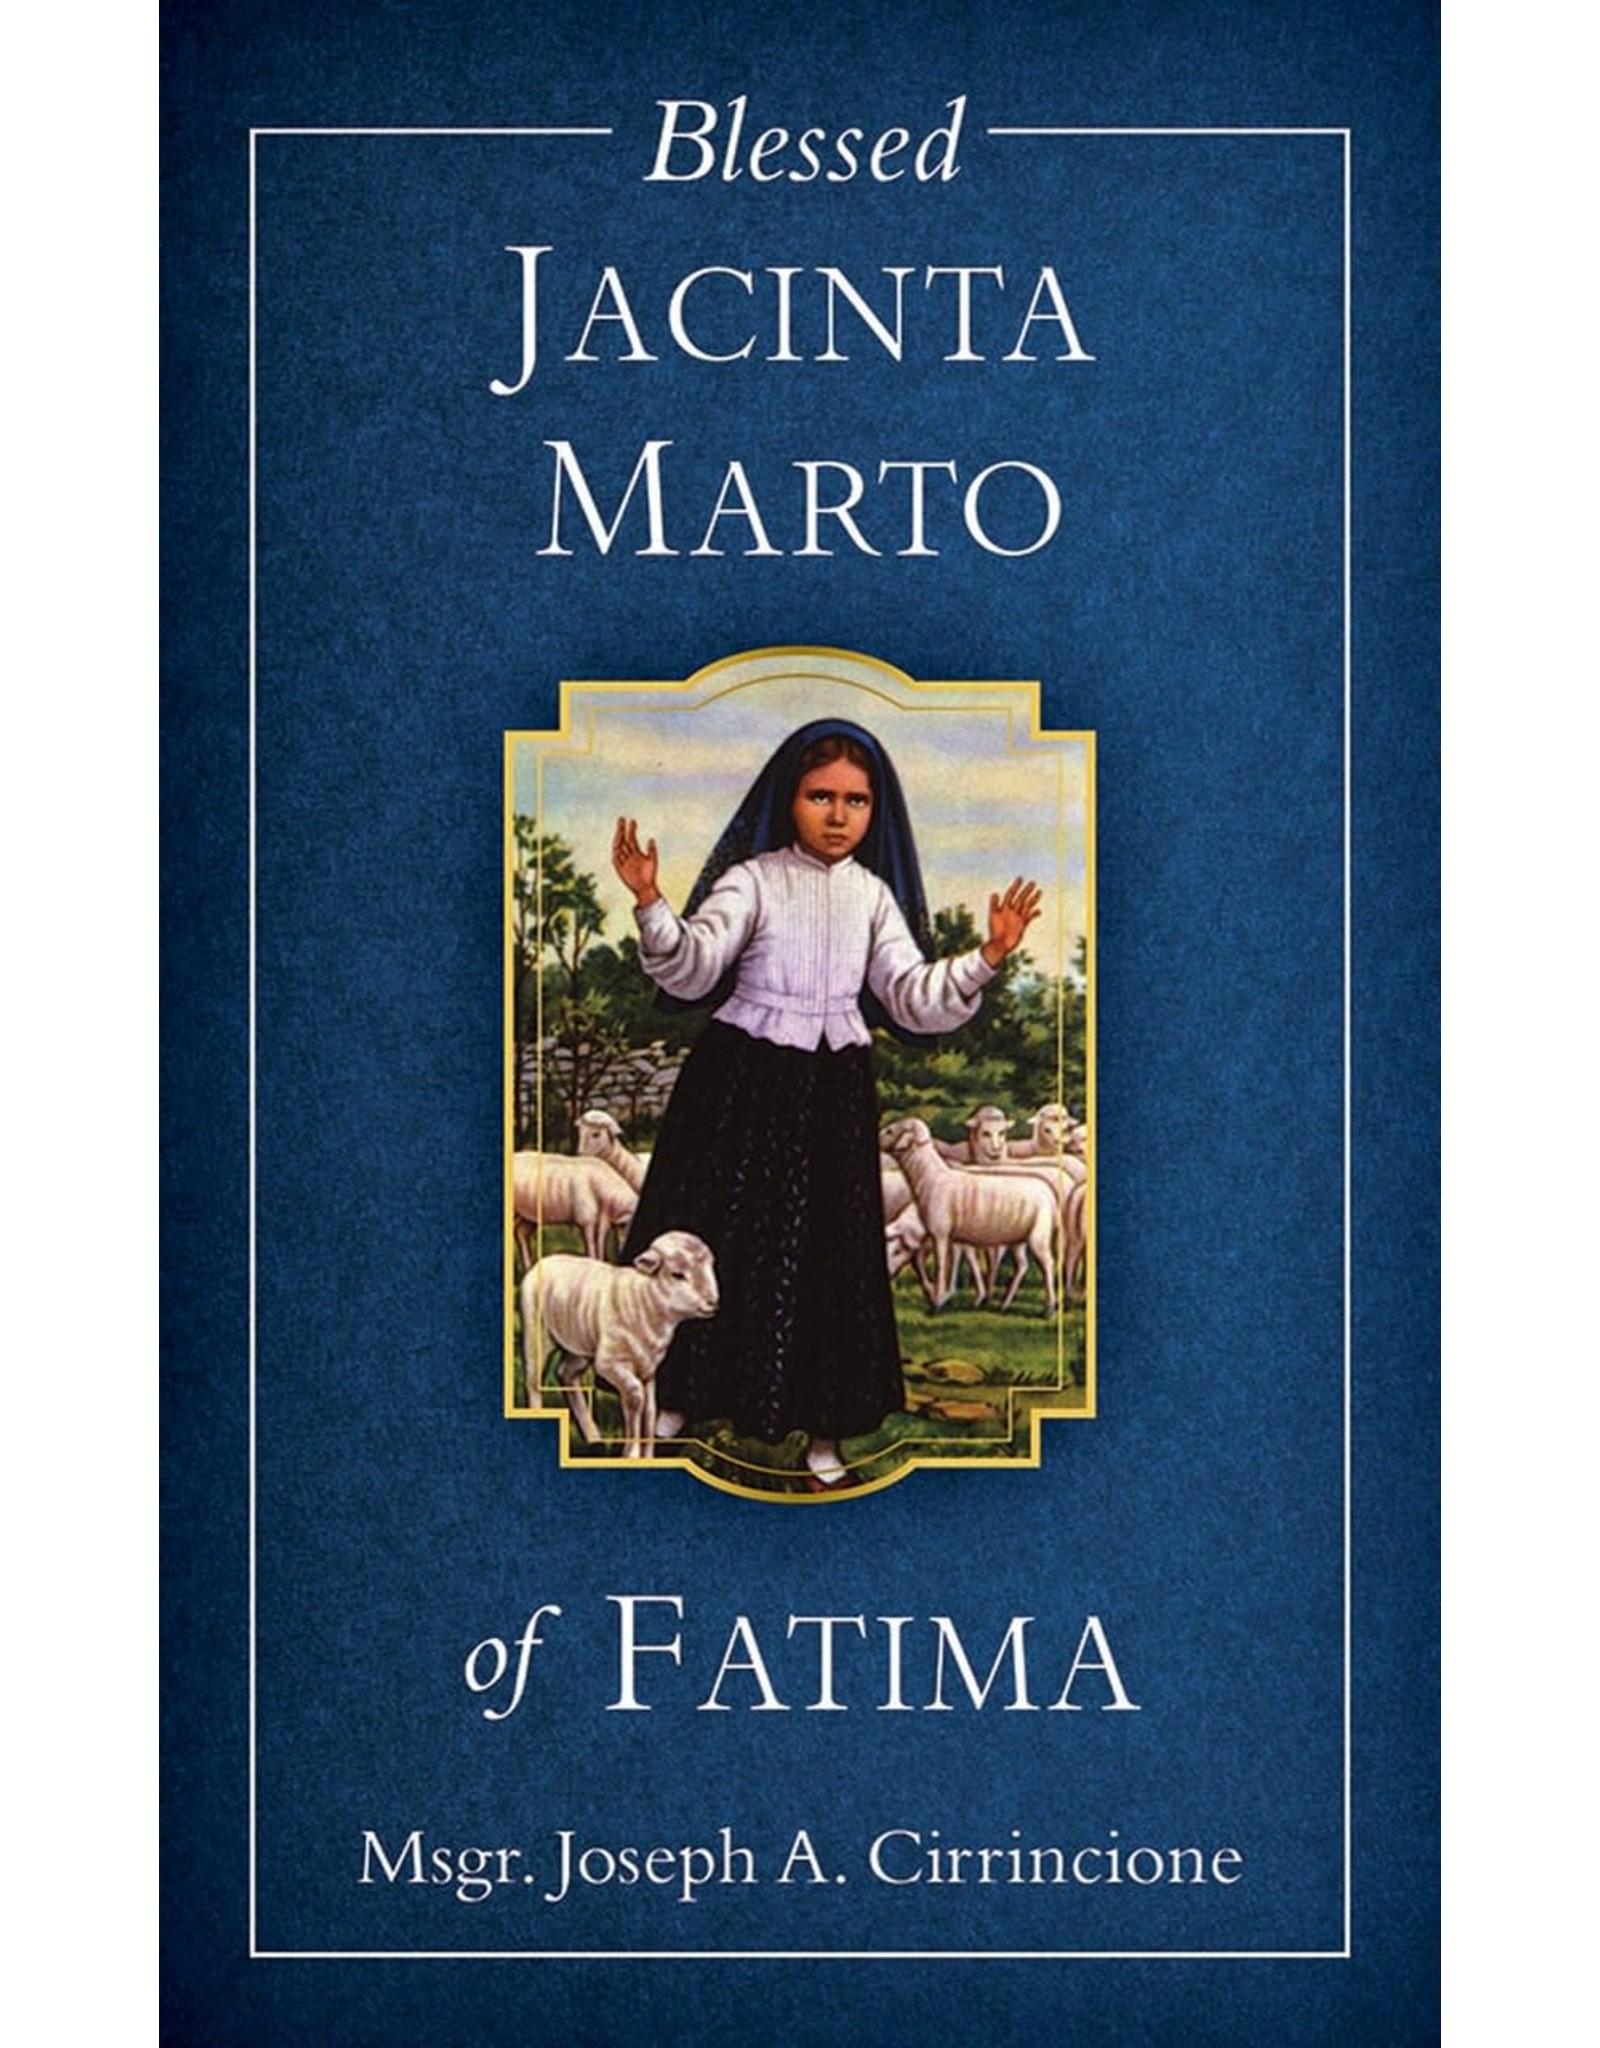 Tan Books Blessed Jacinta Marto of Fatima: Msgr. Joseph A. Cirrincione (Paperback Booklet)